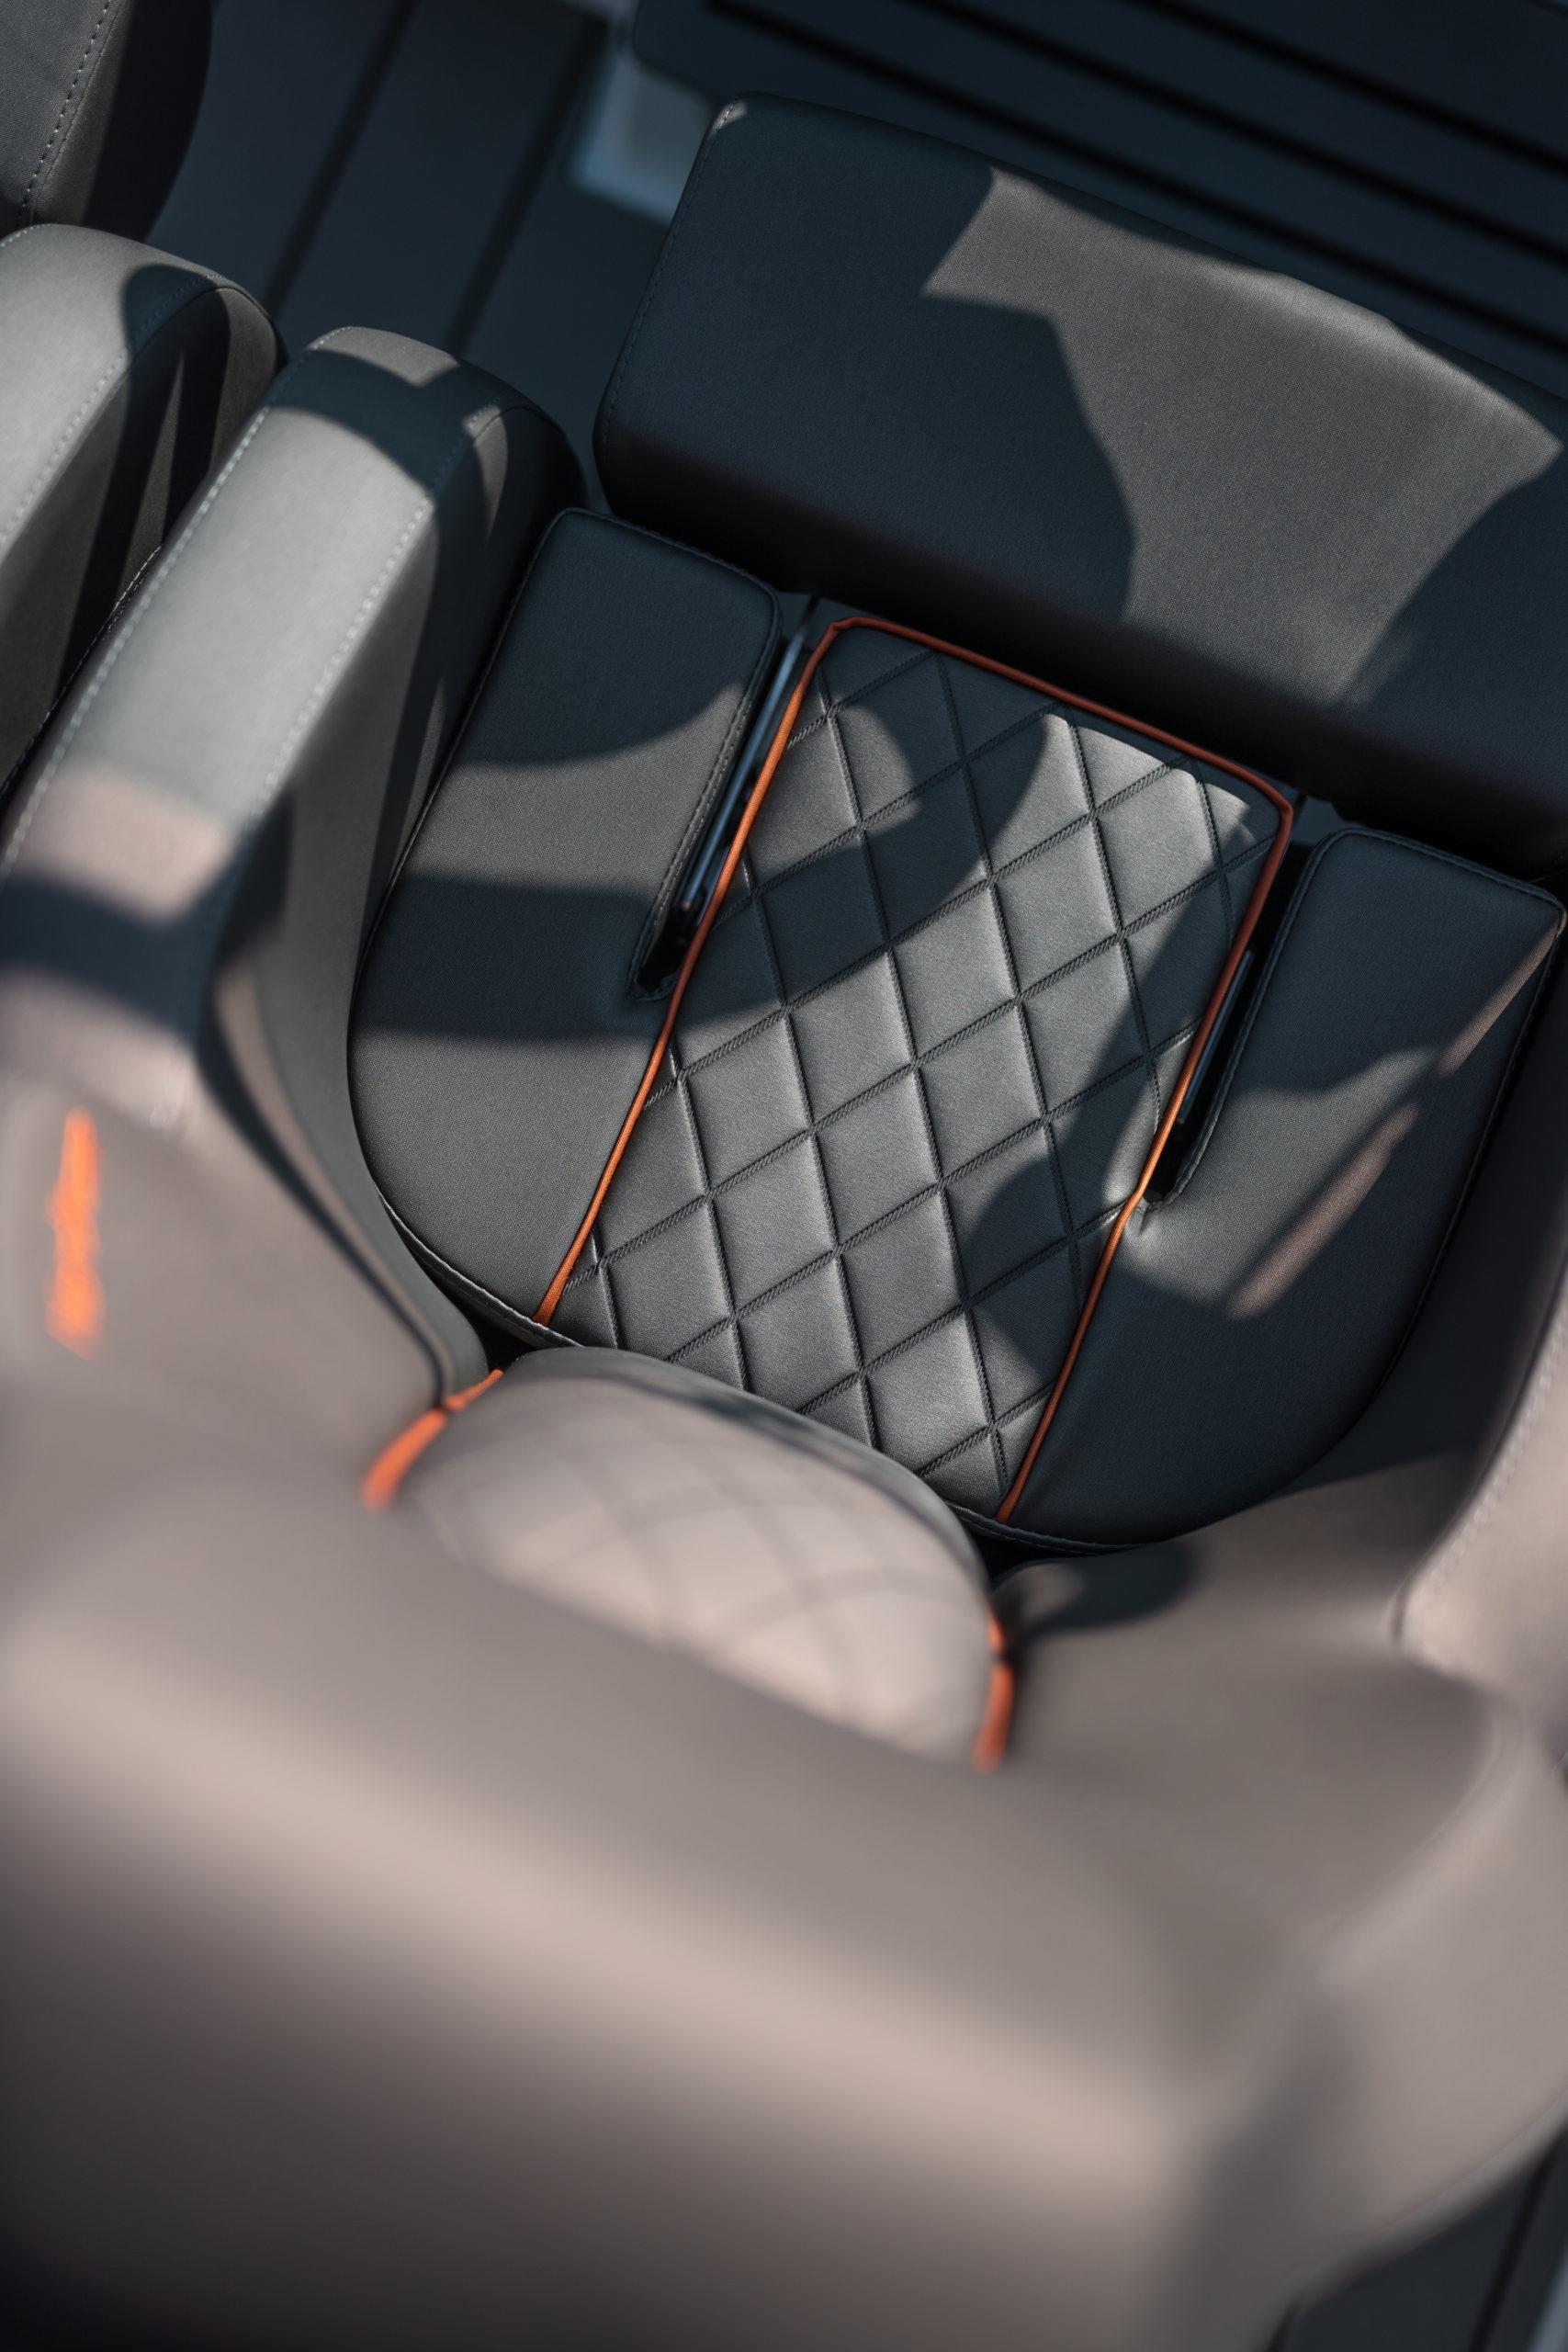 Enduro 805 details - drivers seat